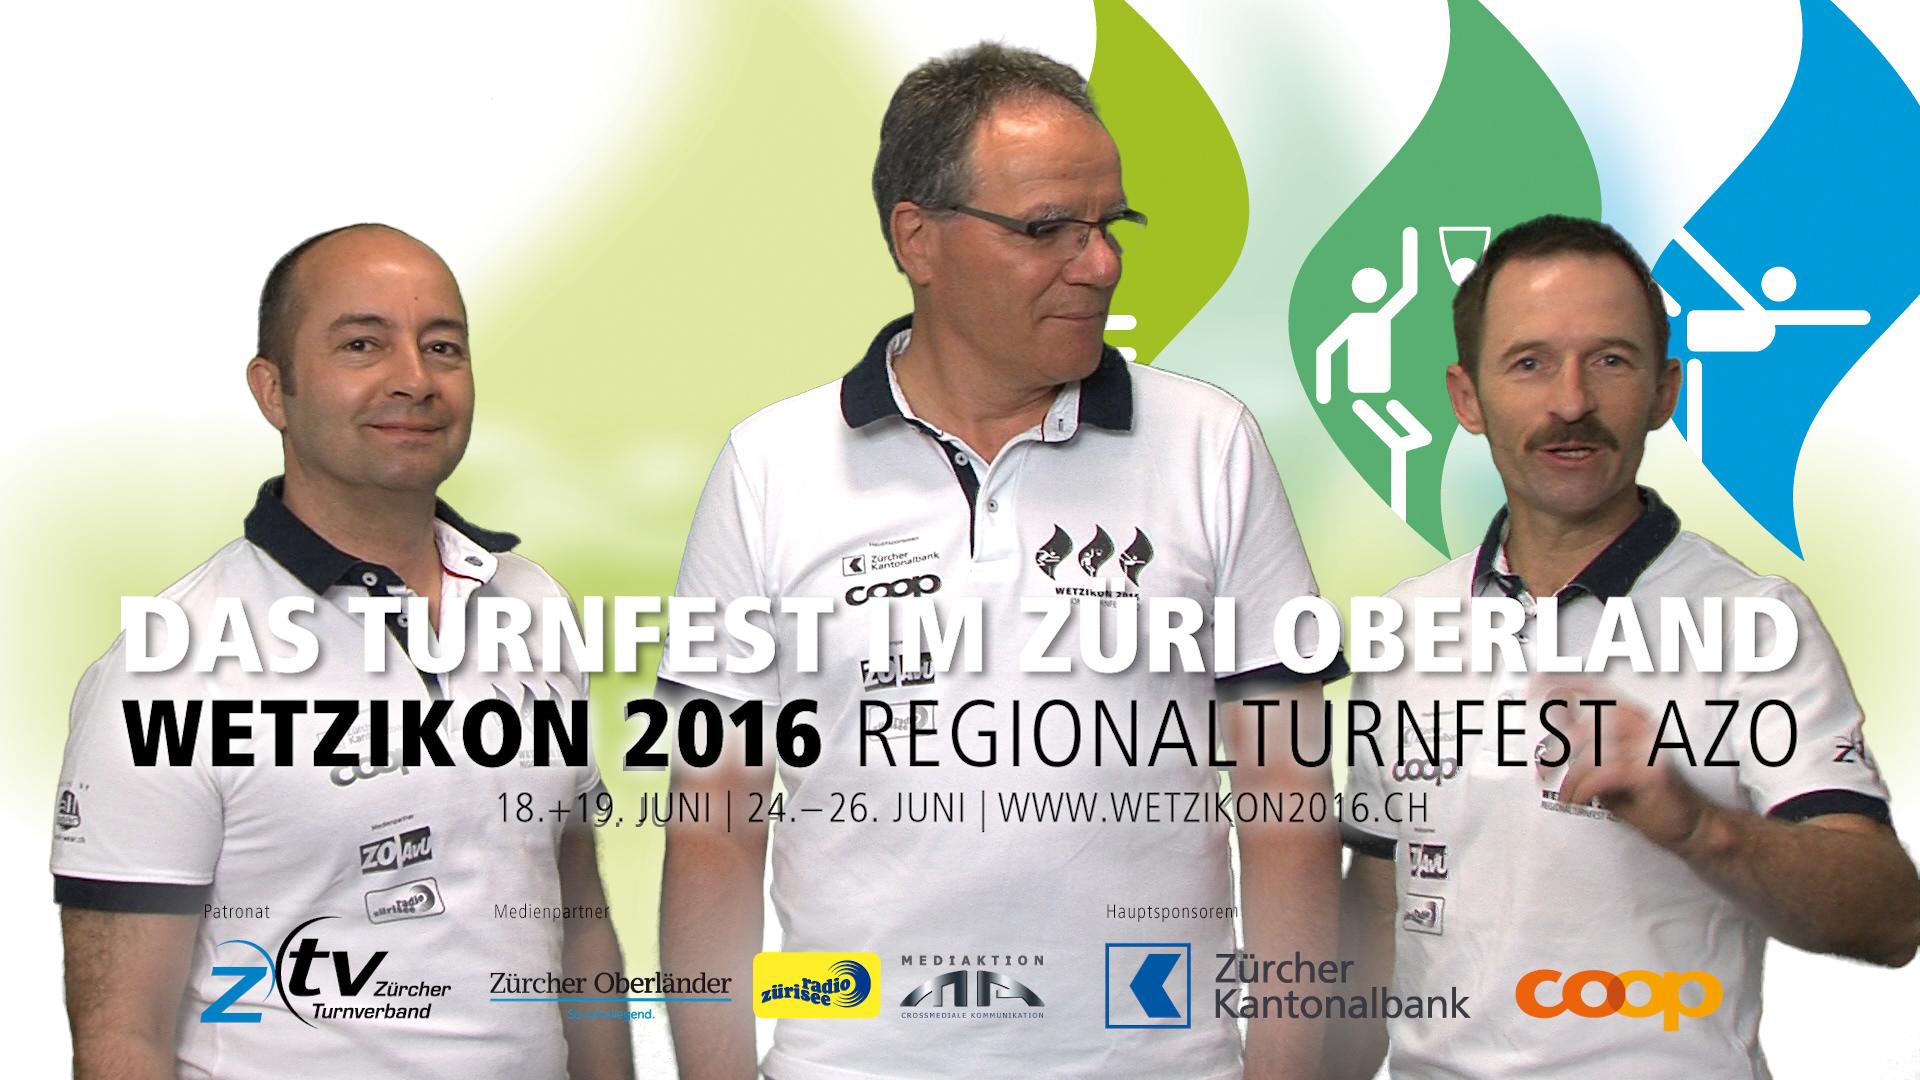 REGIONALTURNFEST Wetzikon 2016